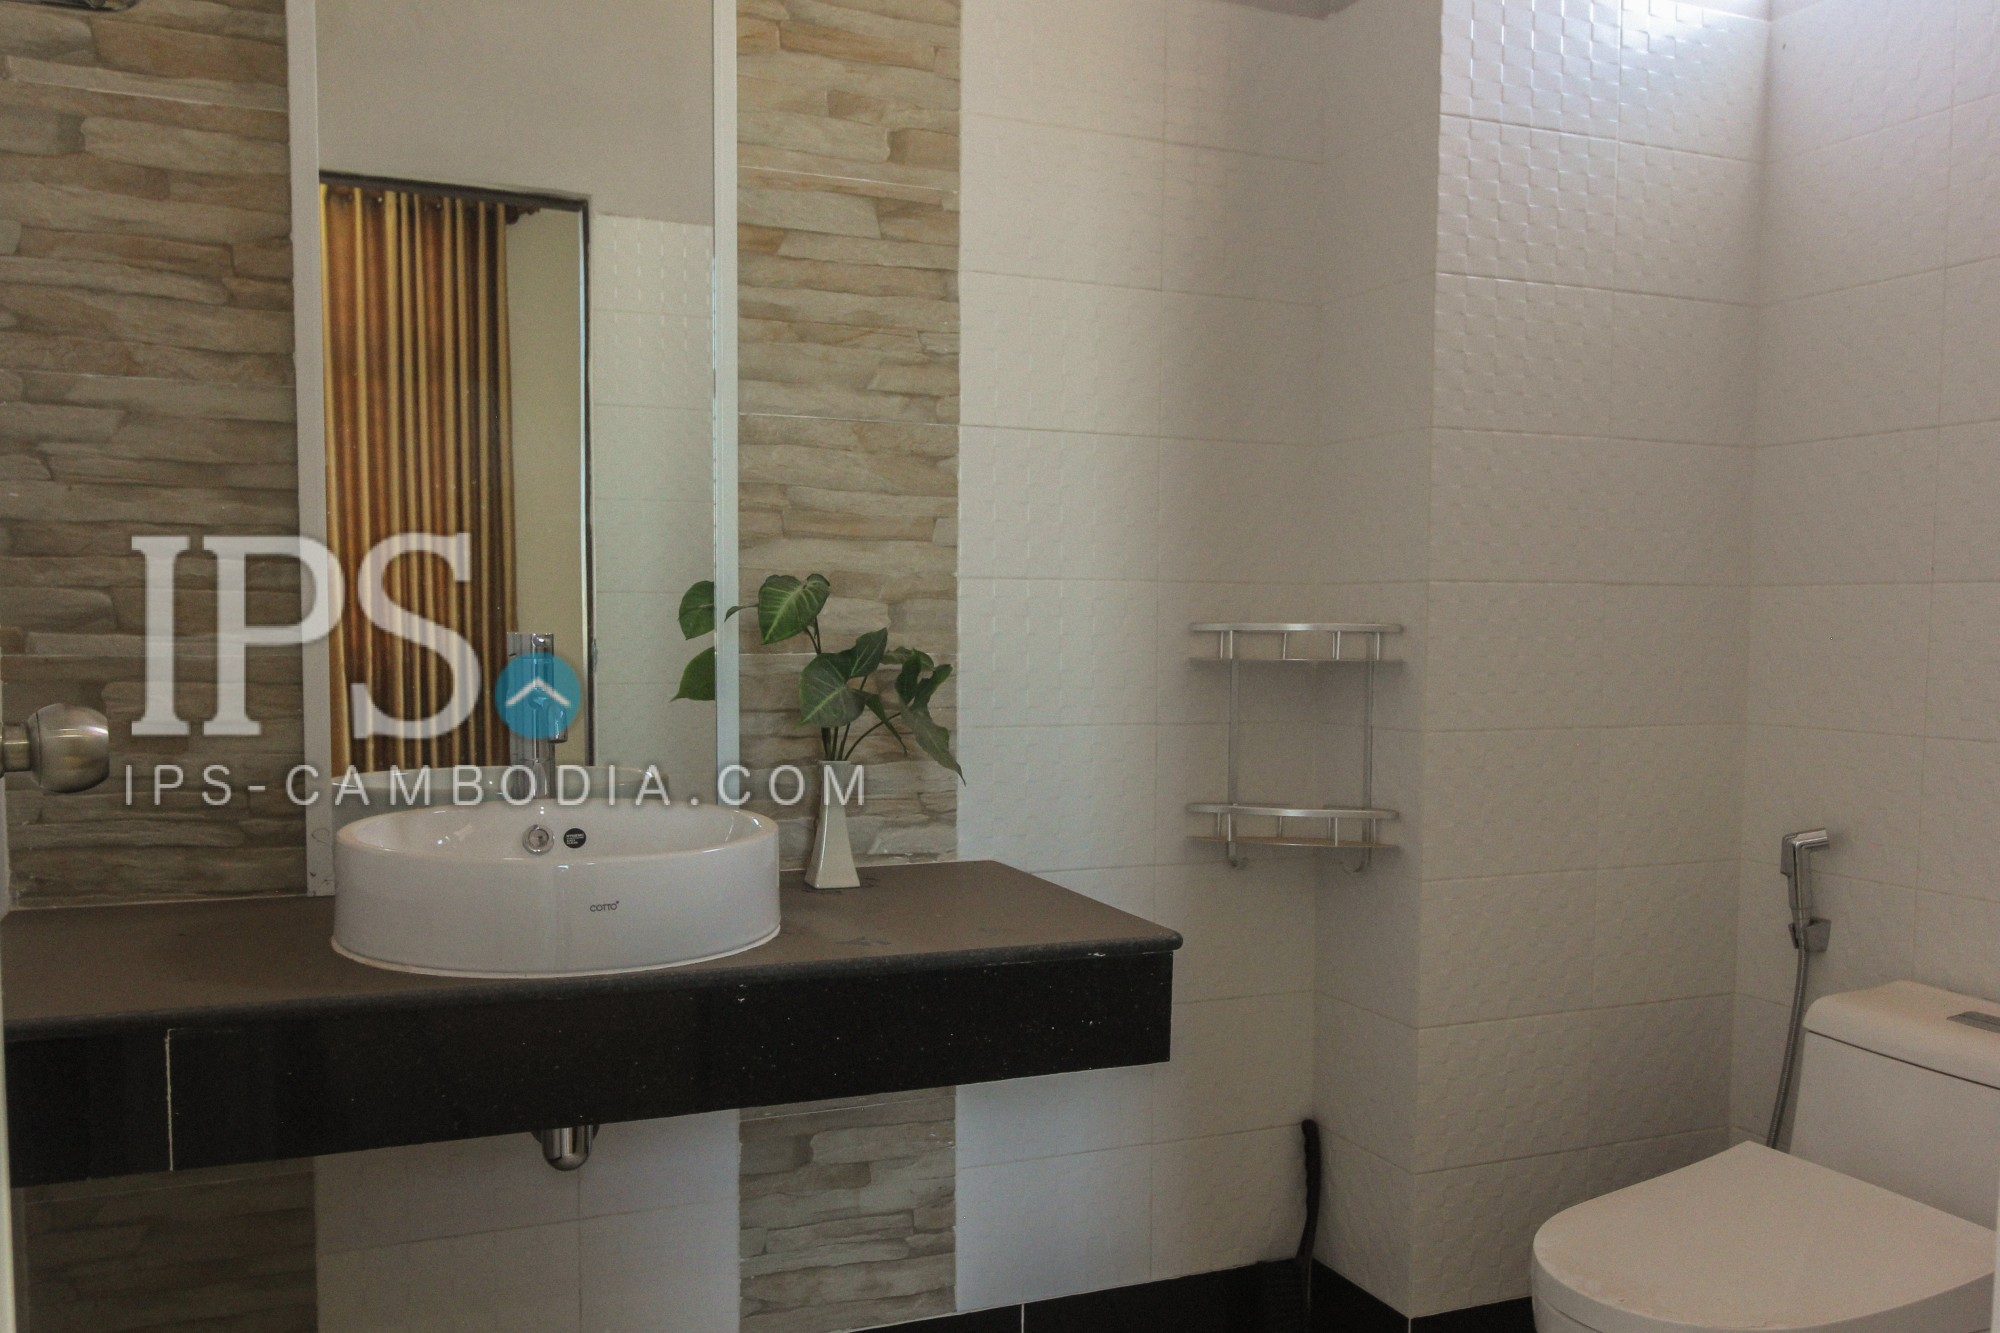 2 Bedrooms Villa for Sale - Siem Reap